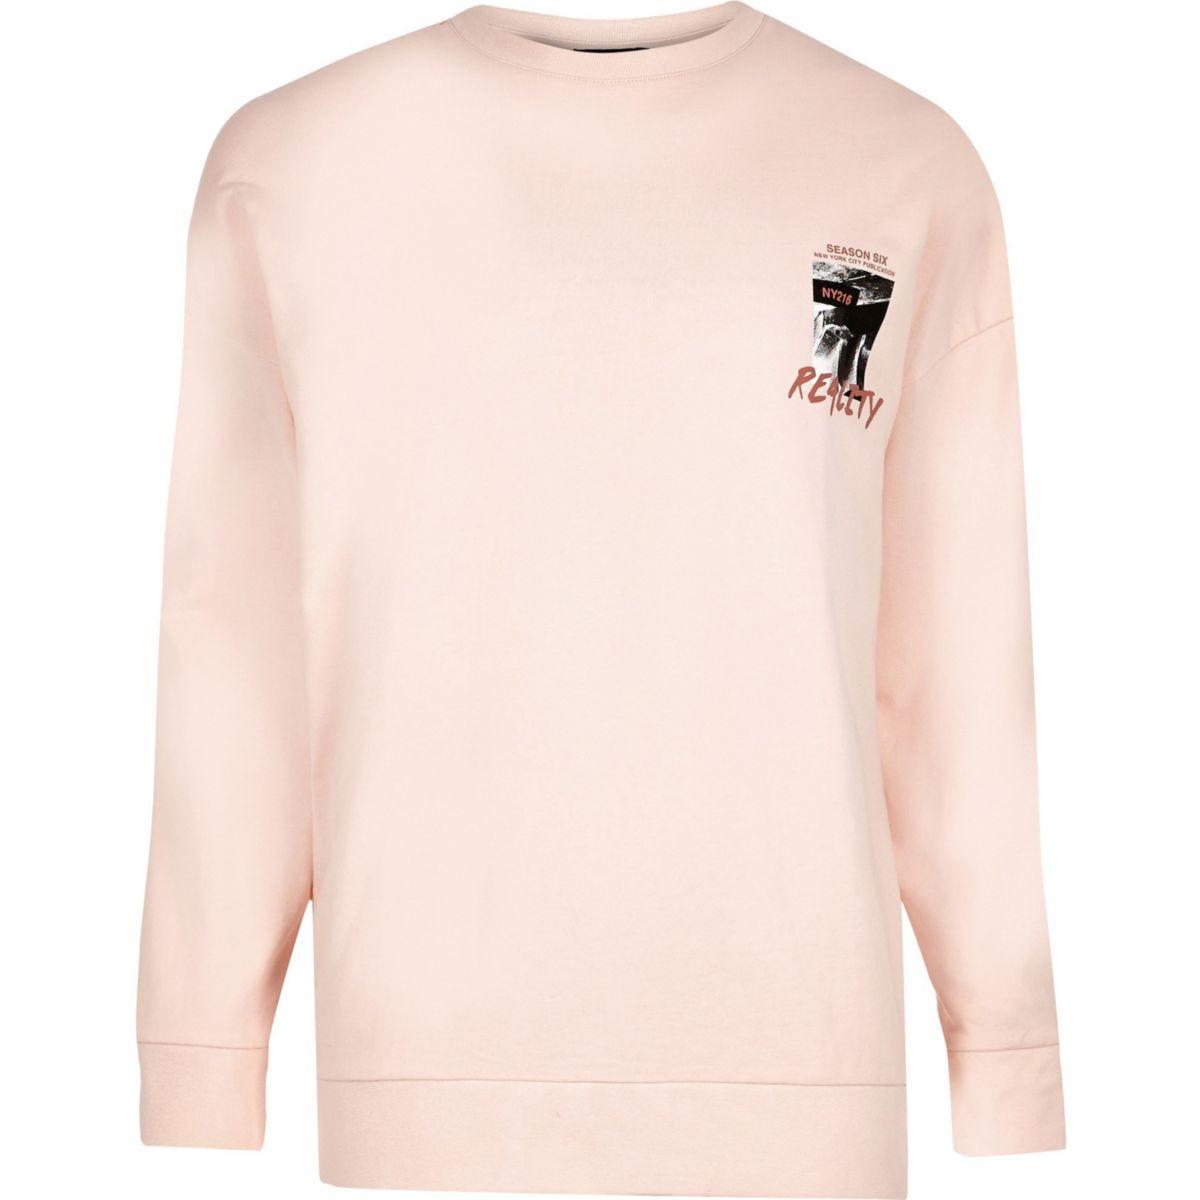 Peach orange 'reality' print sweatshirt